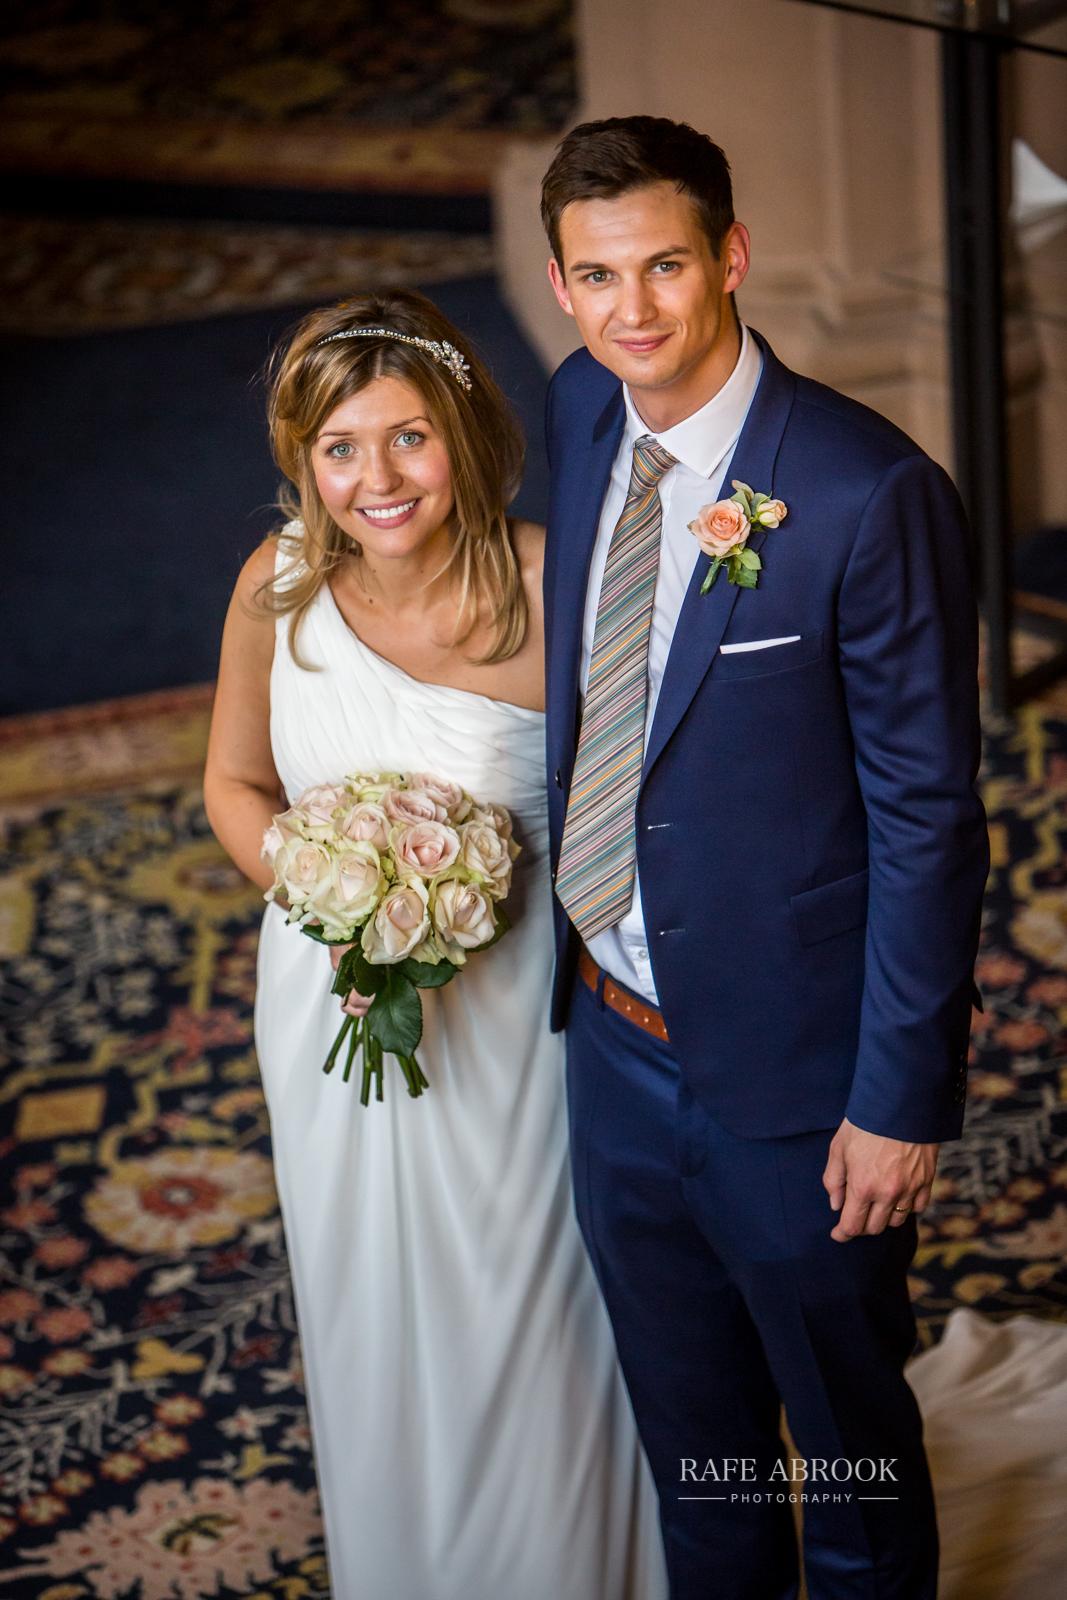 wedding photographer hertfordshire london st pancras renaissance hotel station grand staircase-1167.jpg